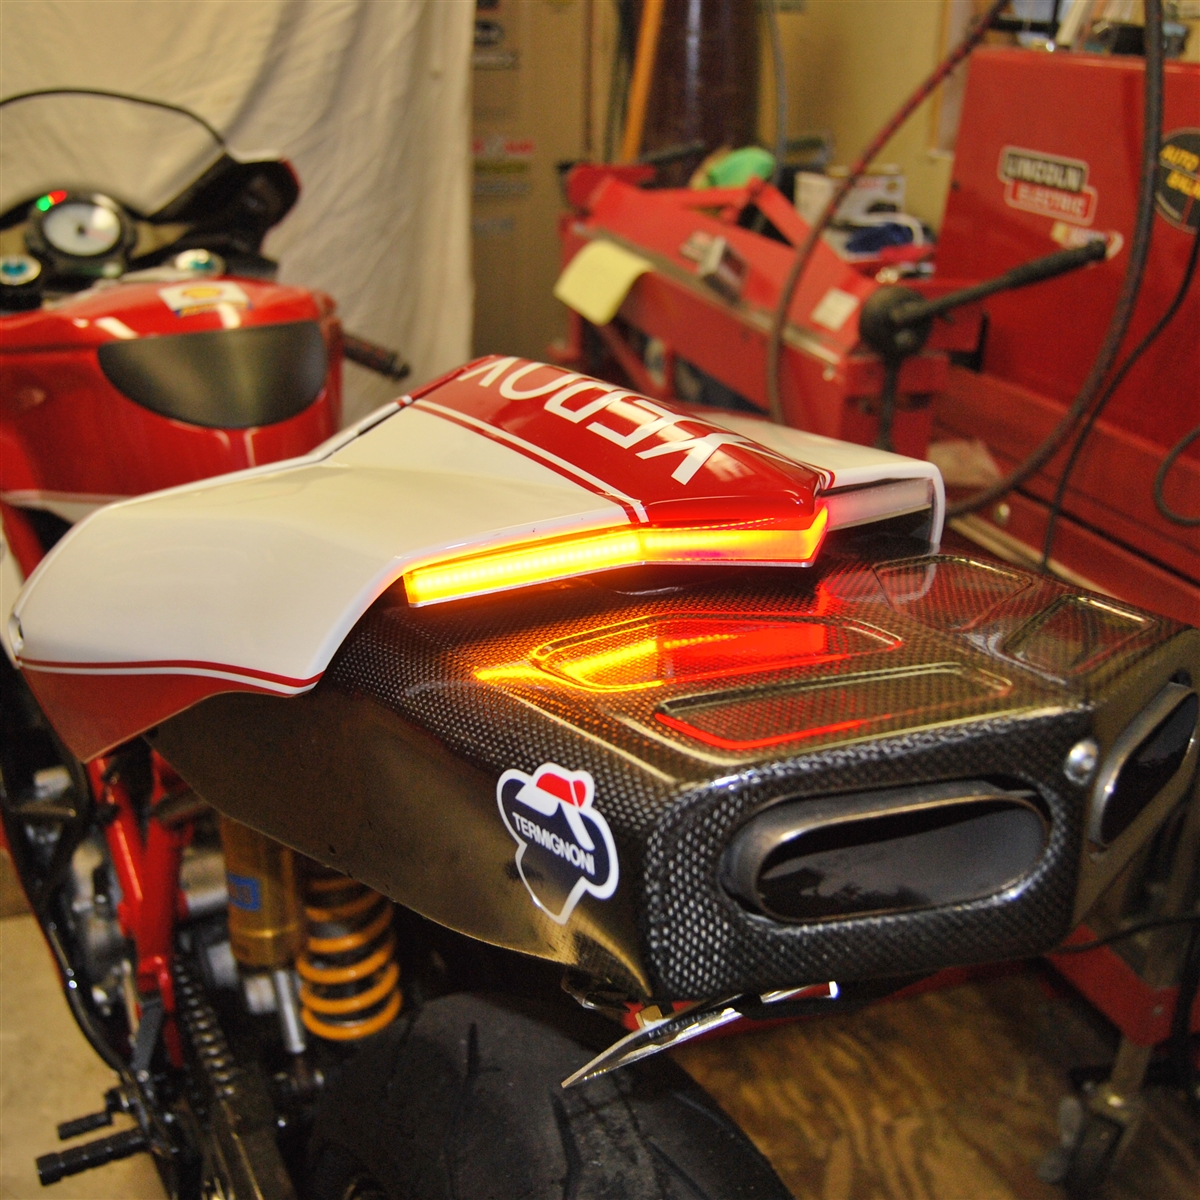 999 Nrc Tail Tidy Install Instructions Ducati Forum 2005 749 Wiring Harness Fe 2